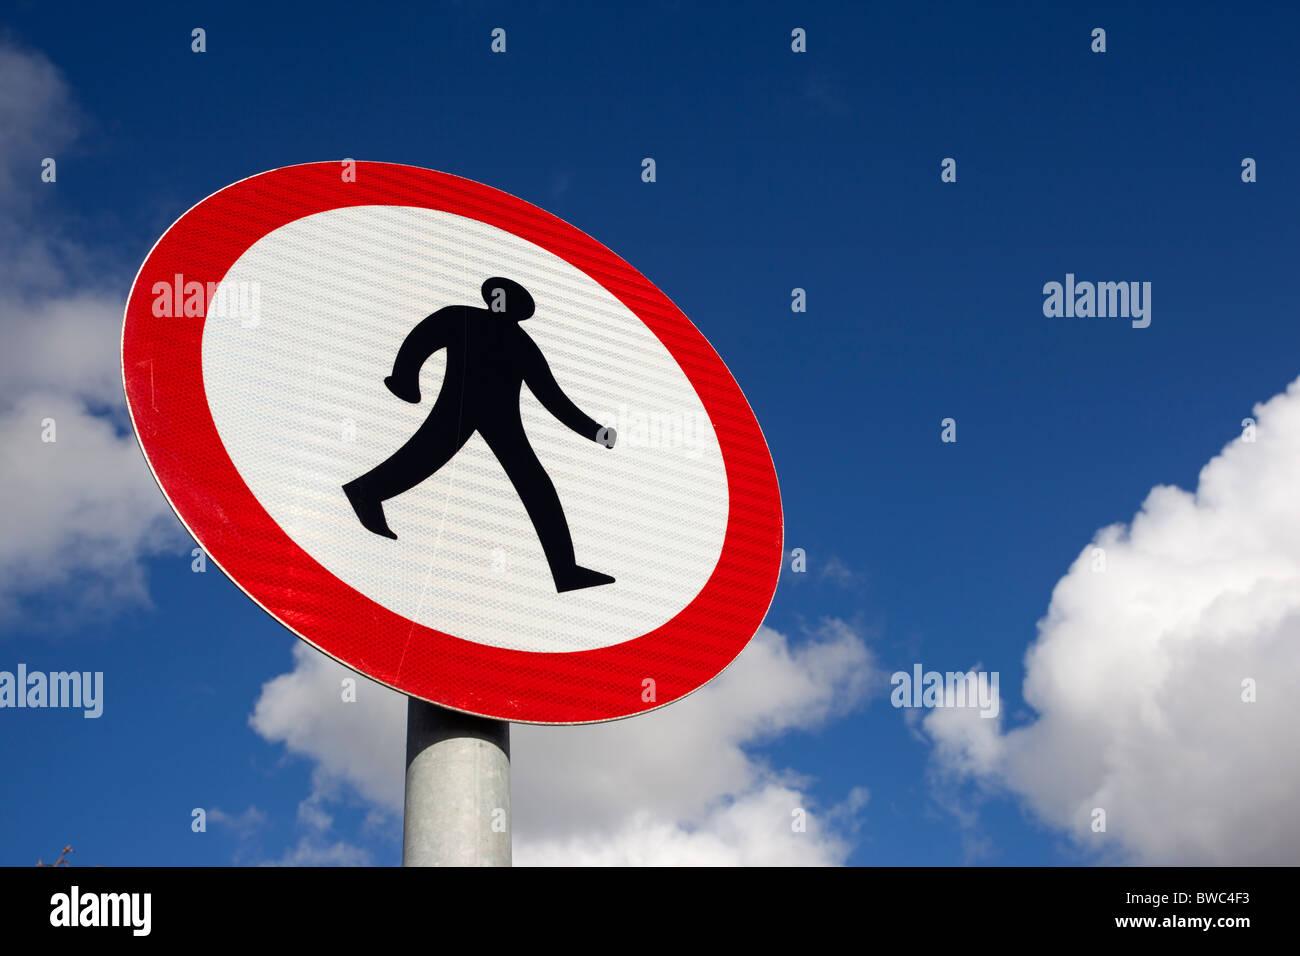 No pedestrians British road sign close up. - Stock Image